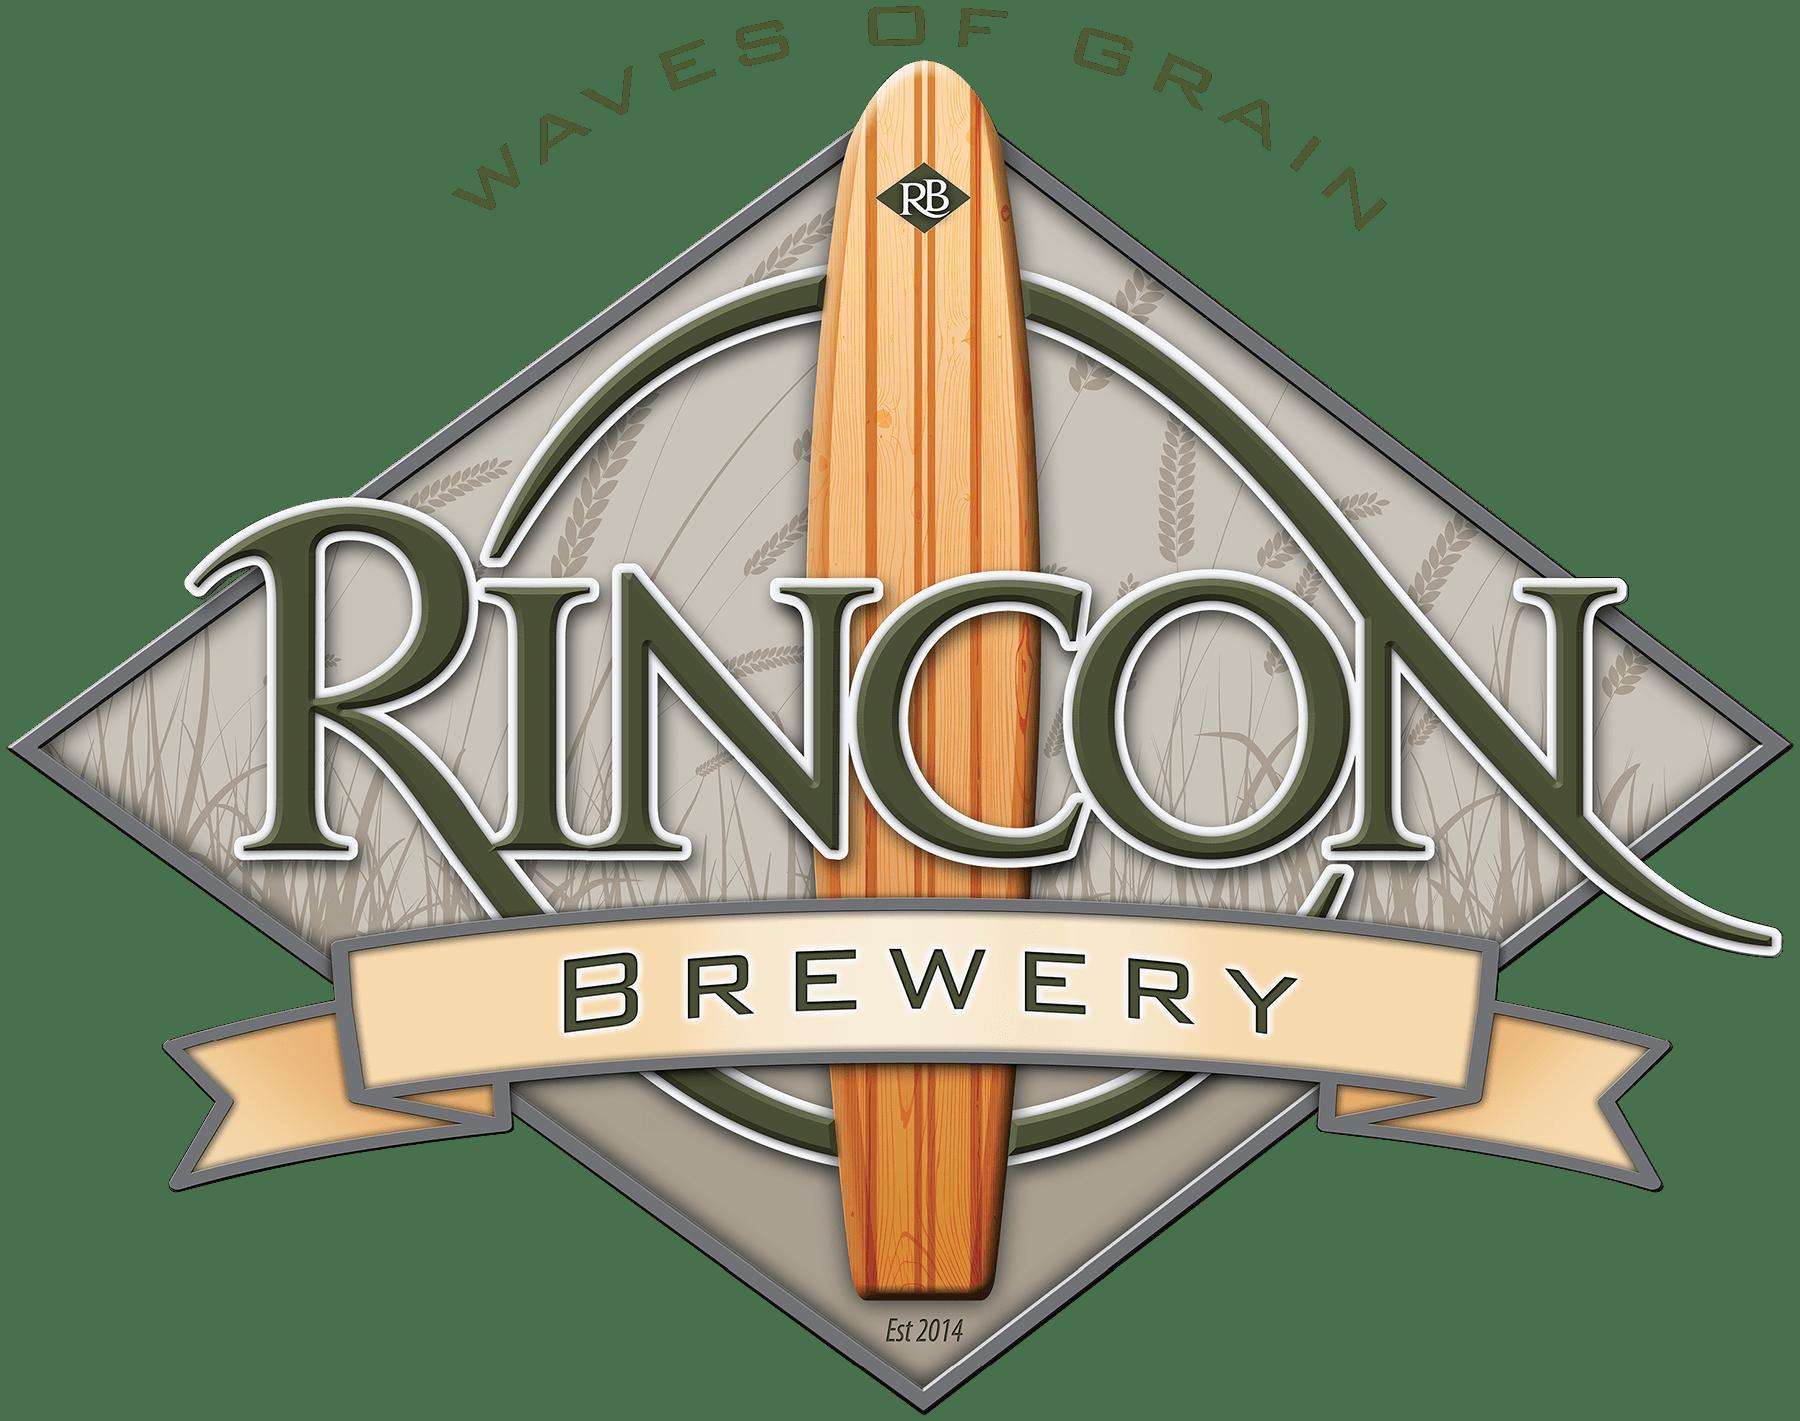 Rincon Brewery logo